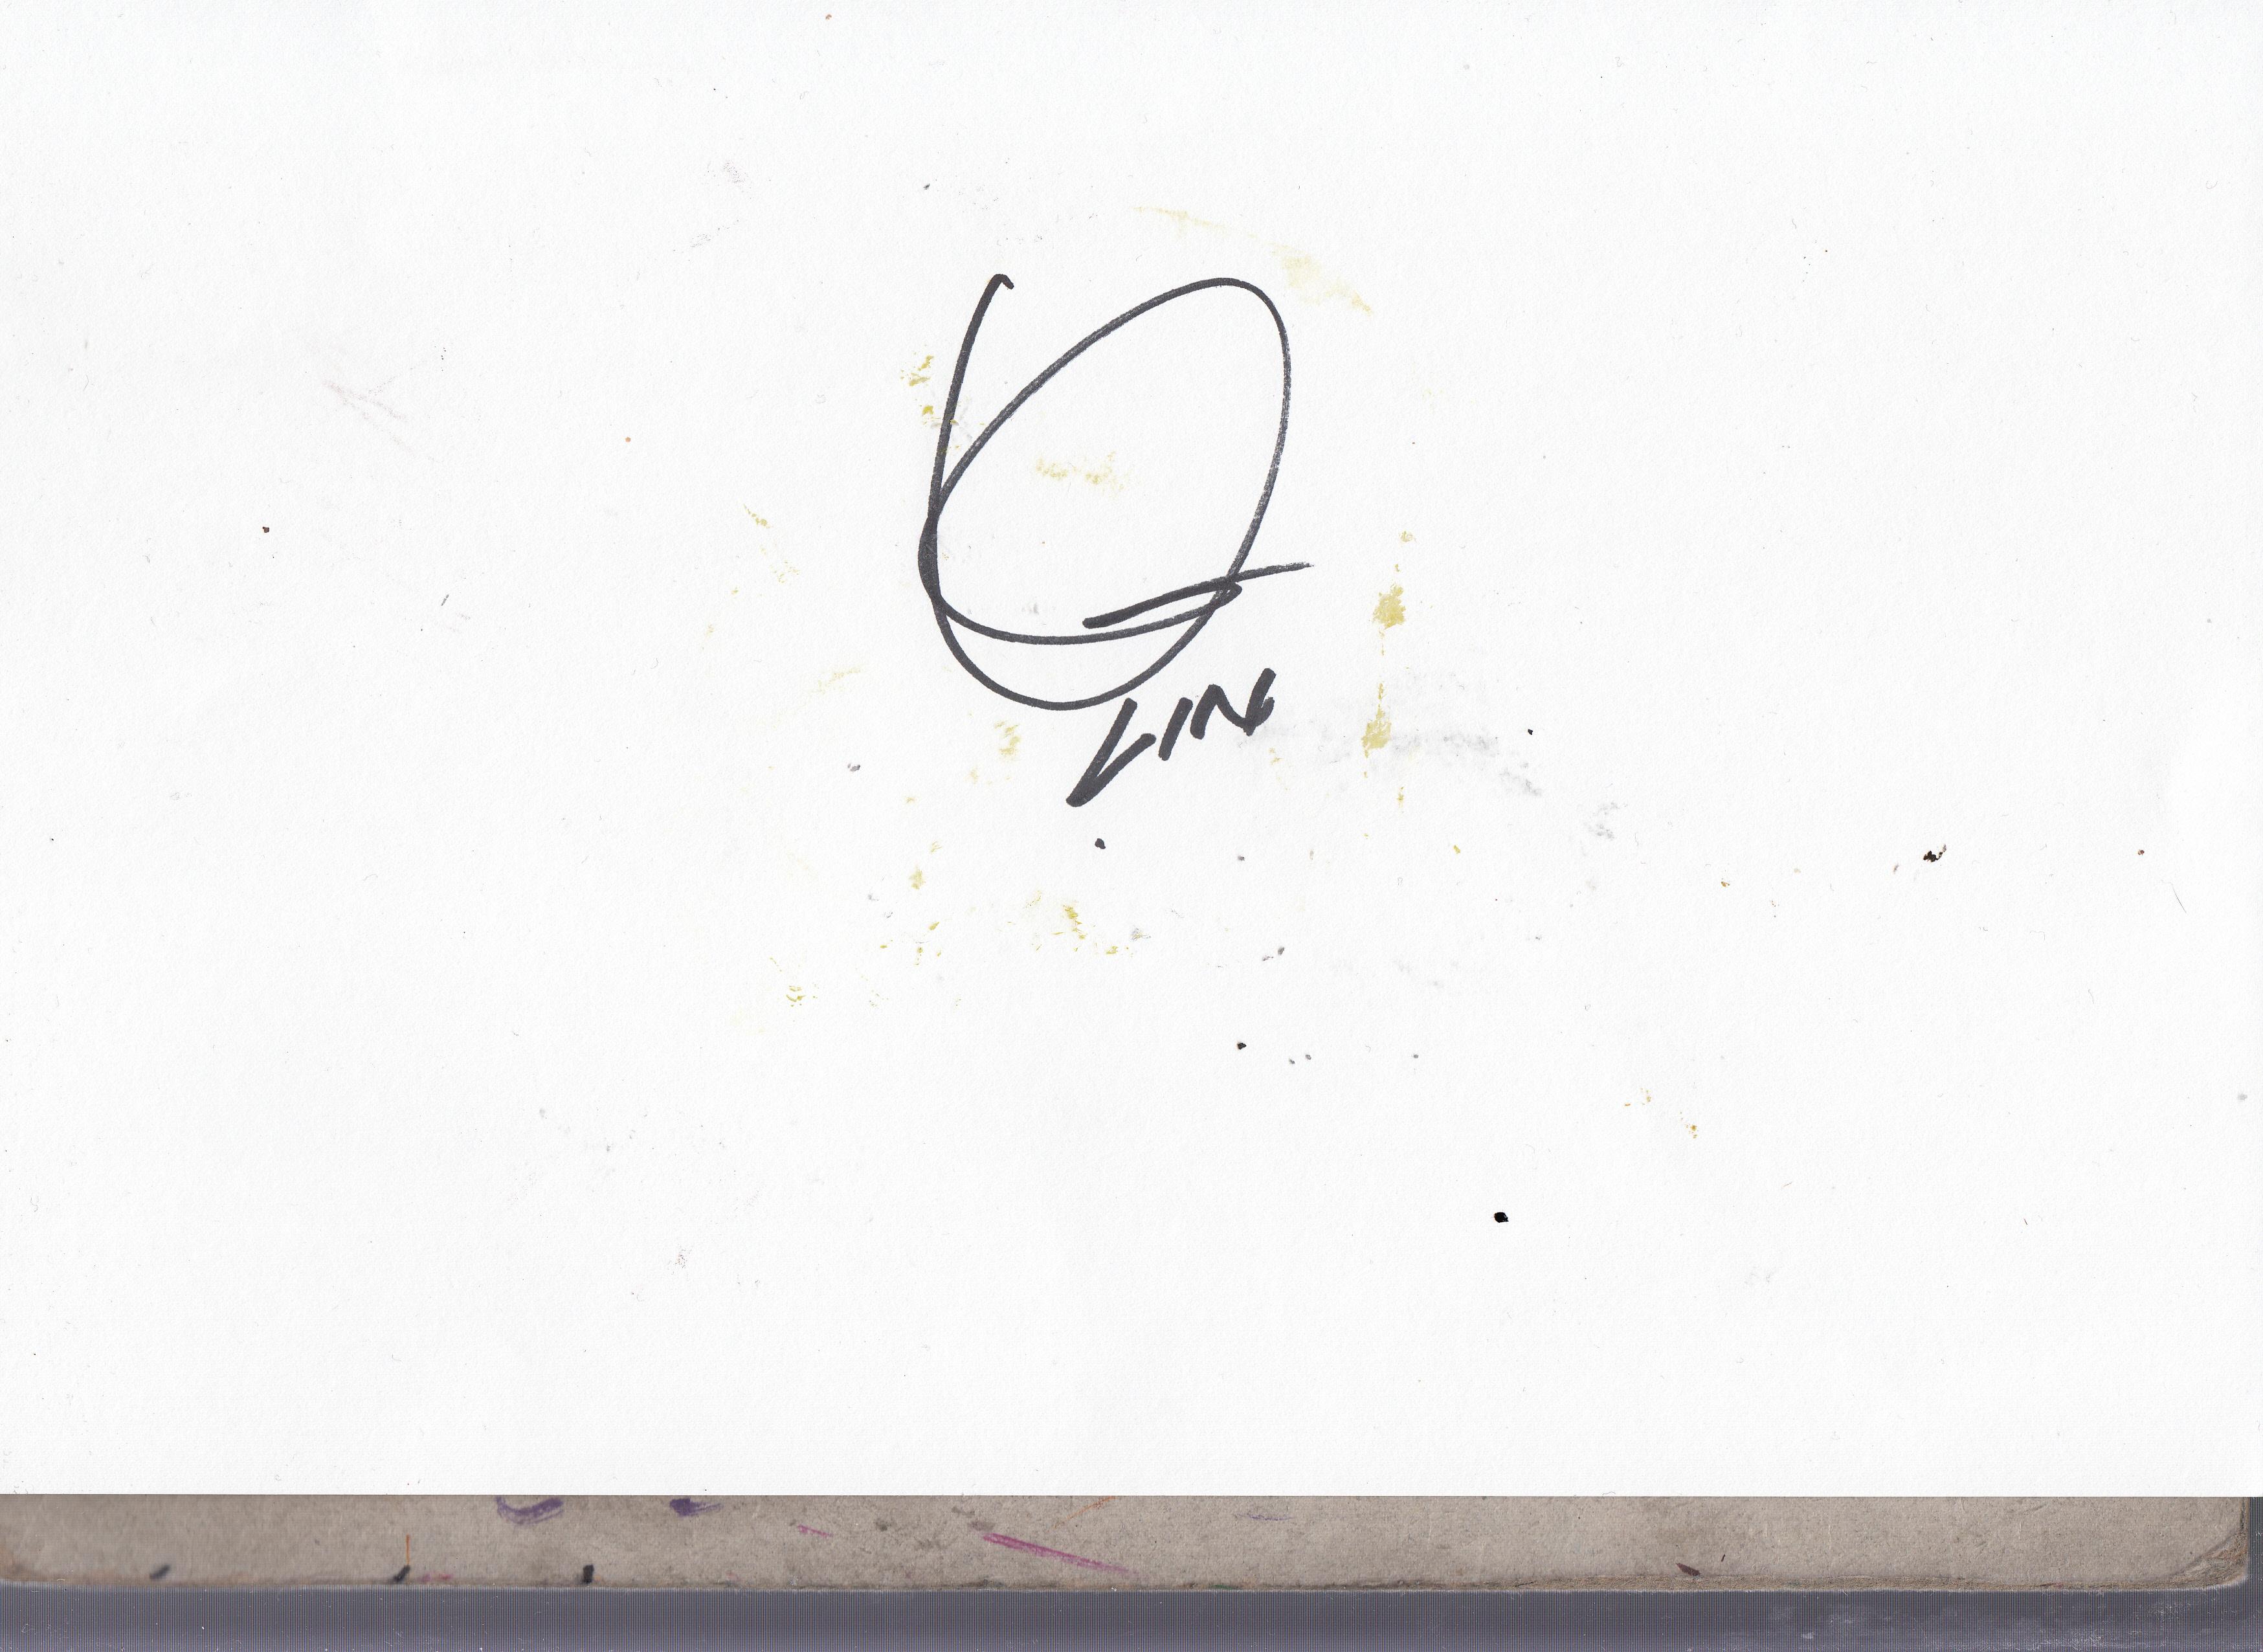 lindsay smith's Signature